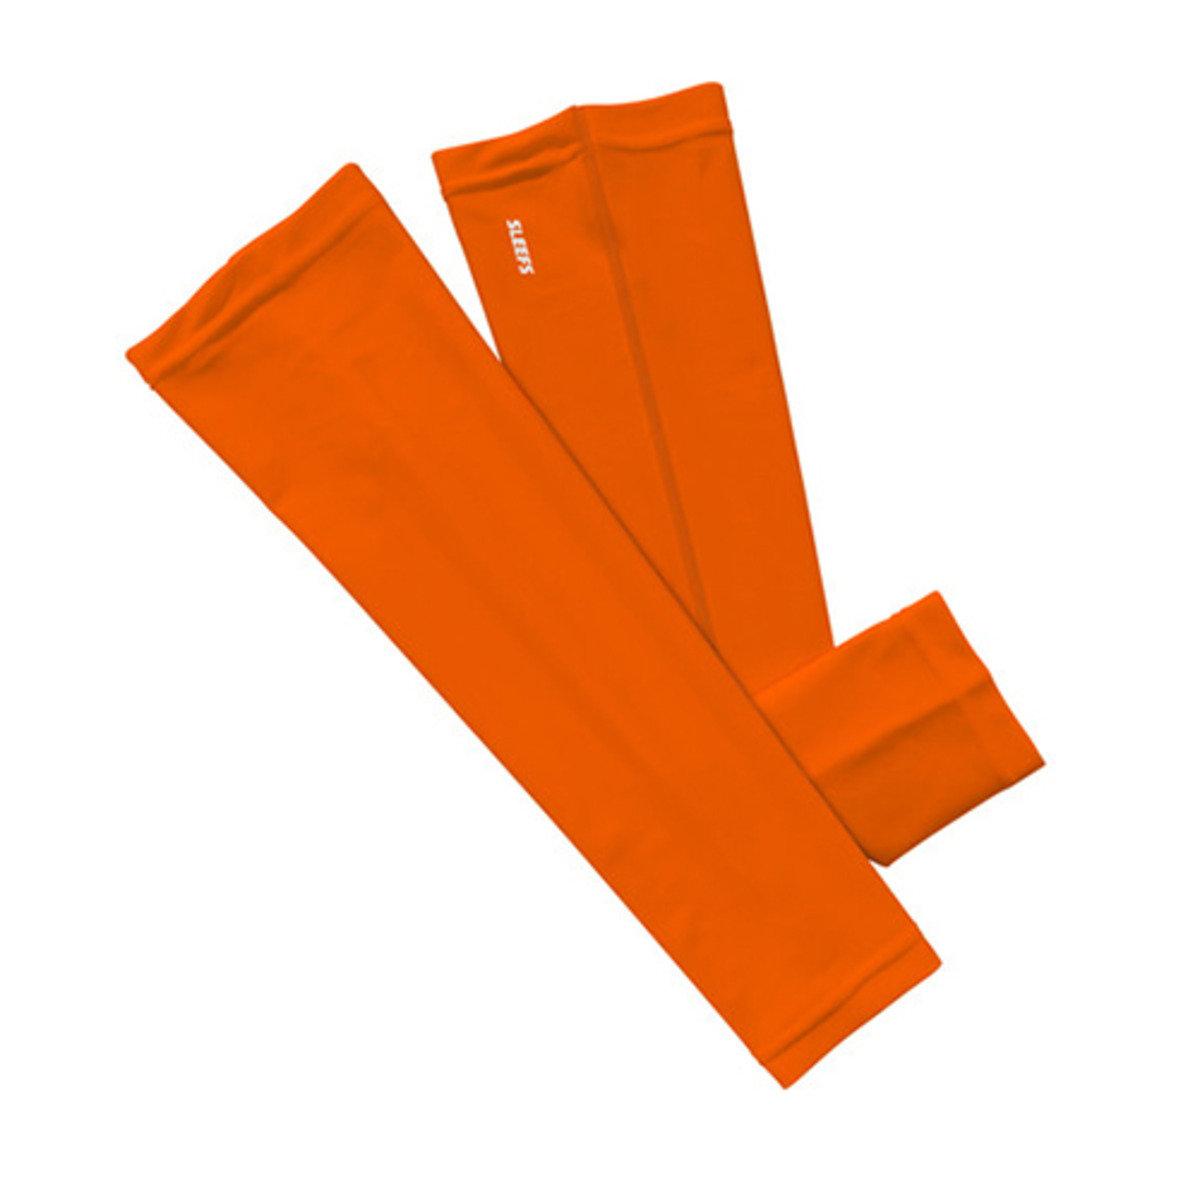 MandarinArmSleeves 防曬手袖